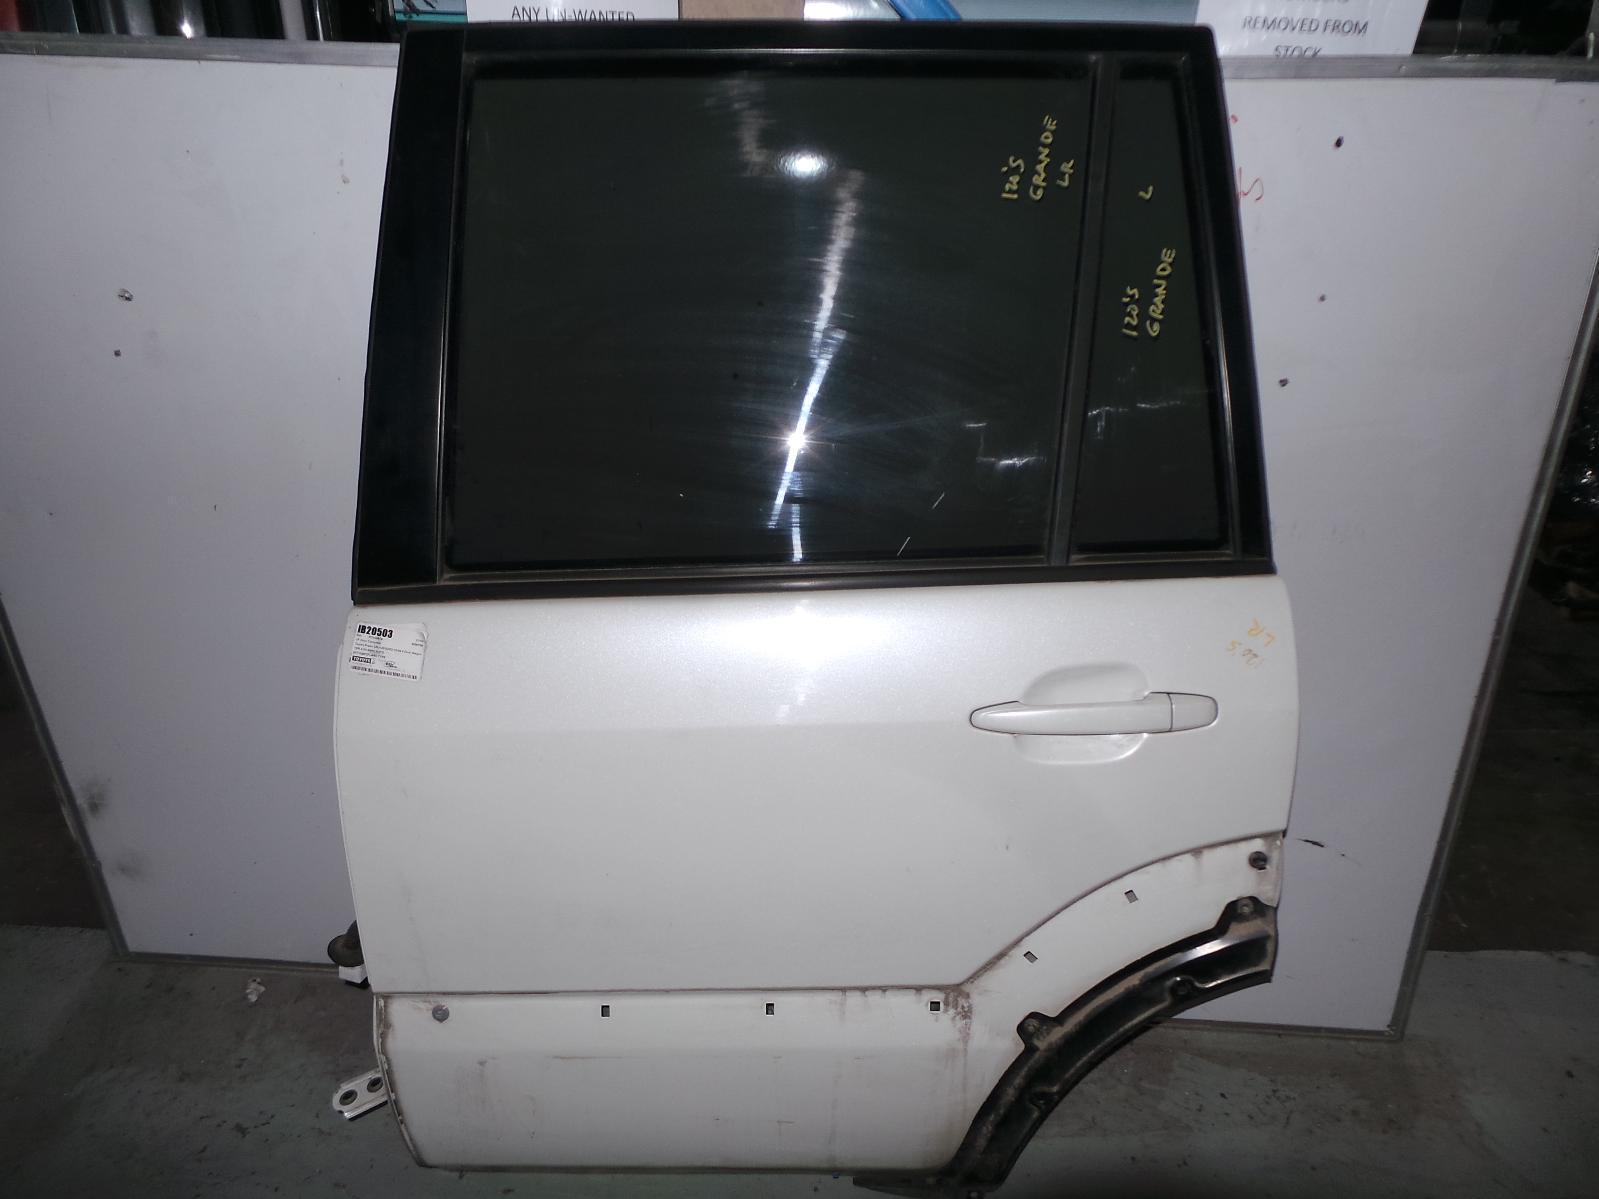 TOYOTA PRADO, Left Rear Door/Sliding, 120 SERIES, FLARED TYPE, 02/03-10/09